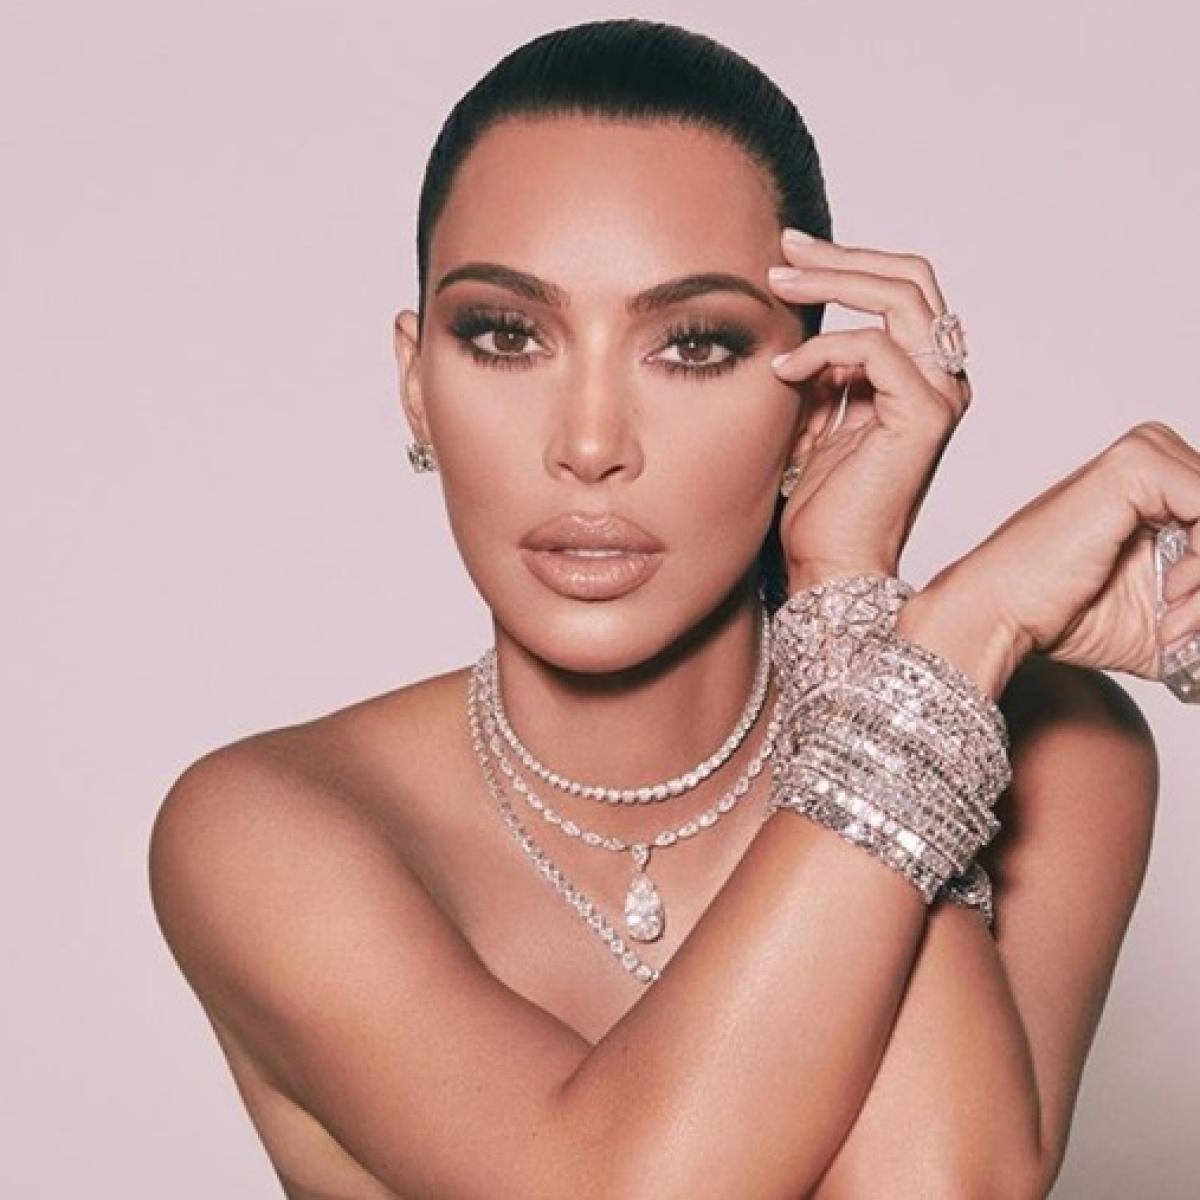 Kim Kardashian a liar? Reality star seen wearing diamond ring she said was stolen in 2016 Paris robbery